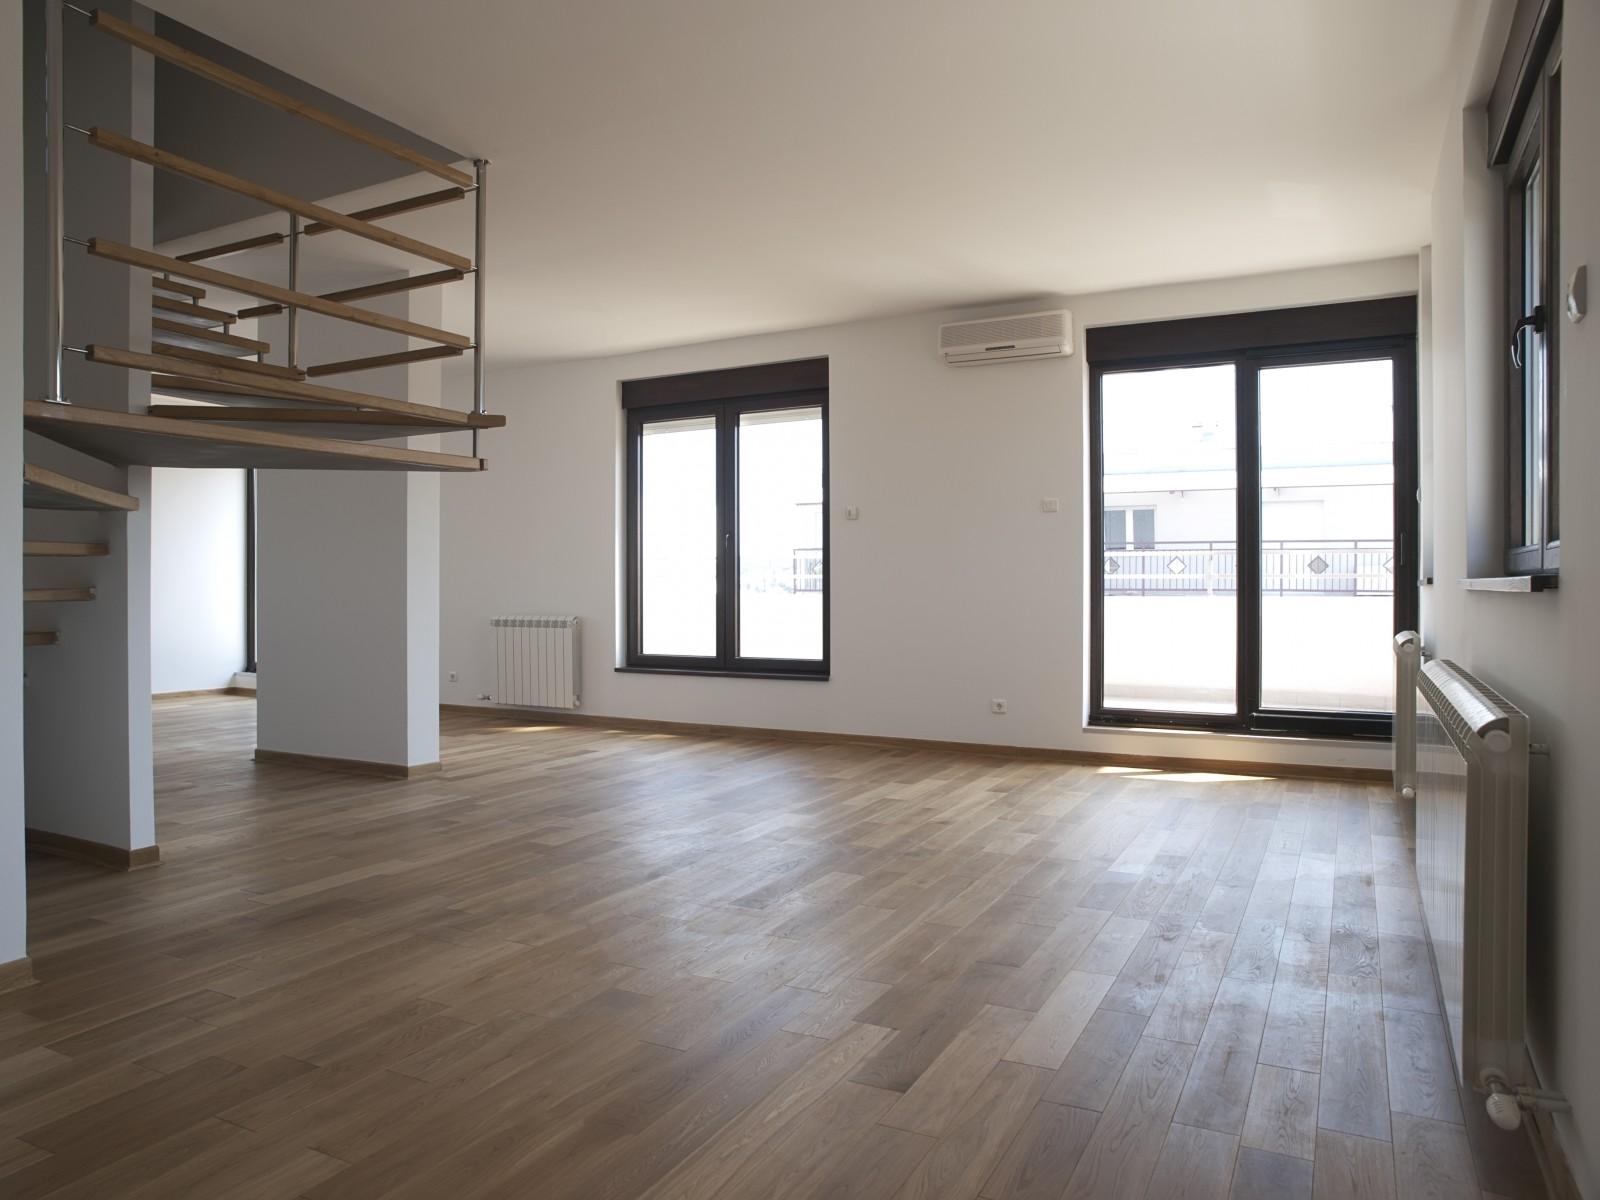 Latest New York Property Taxes Forum Posts